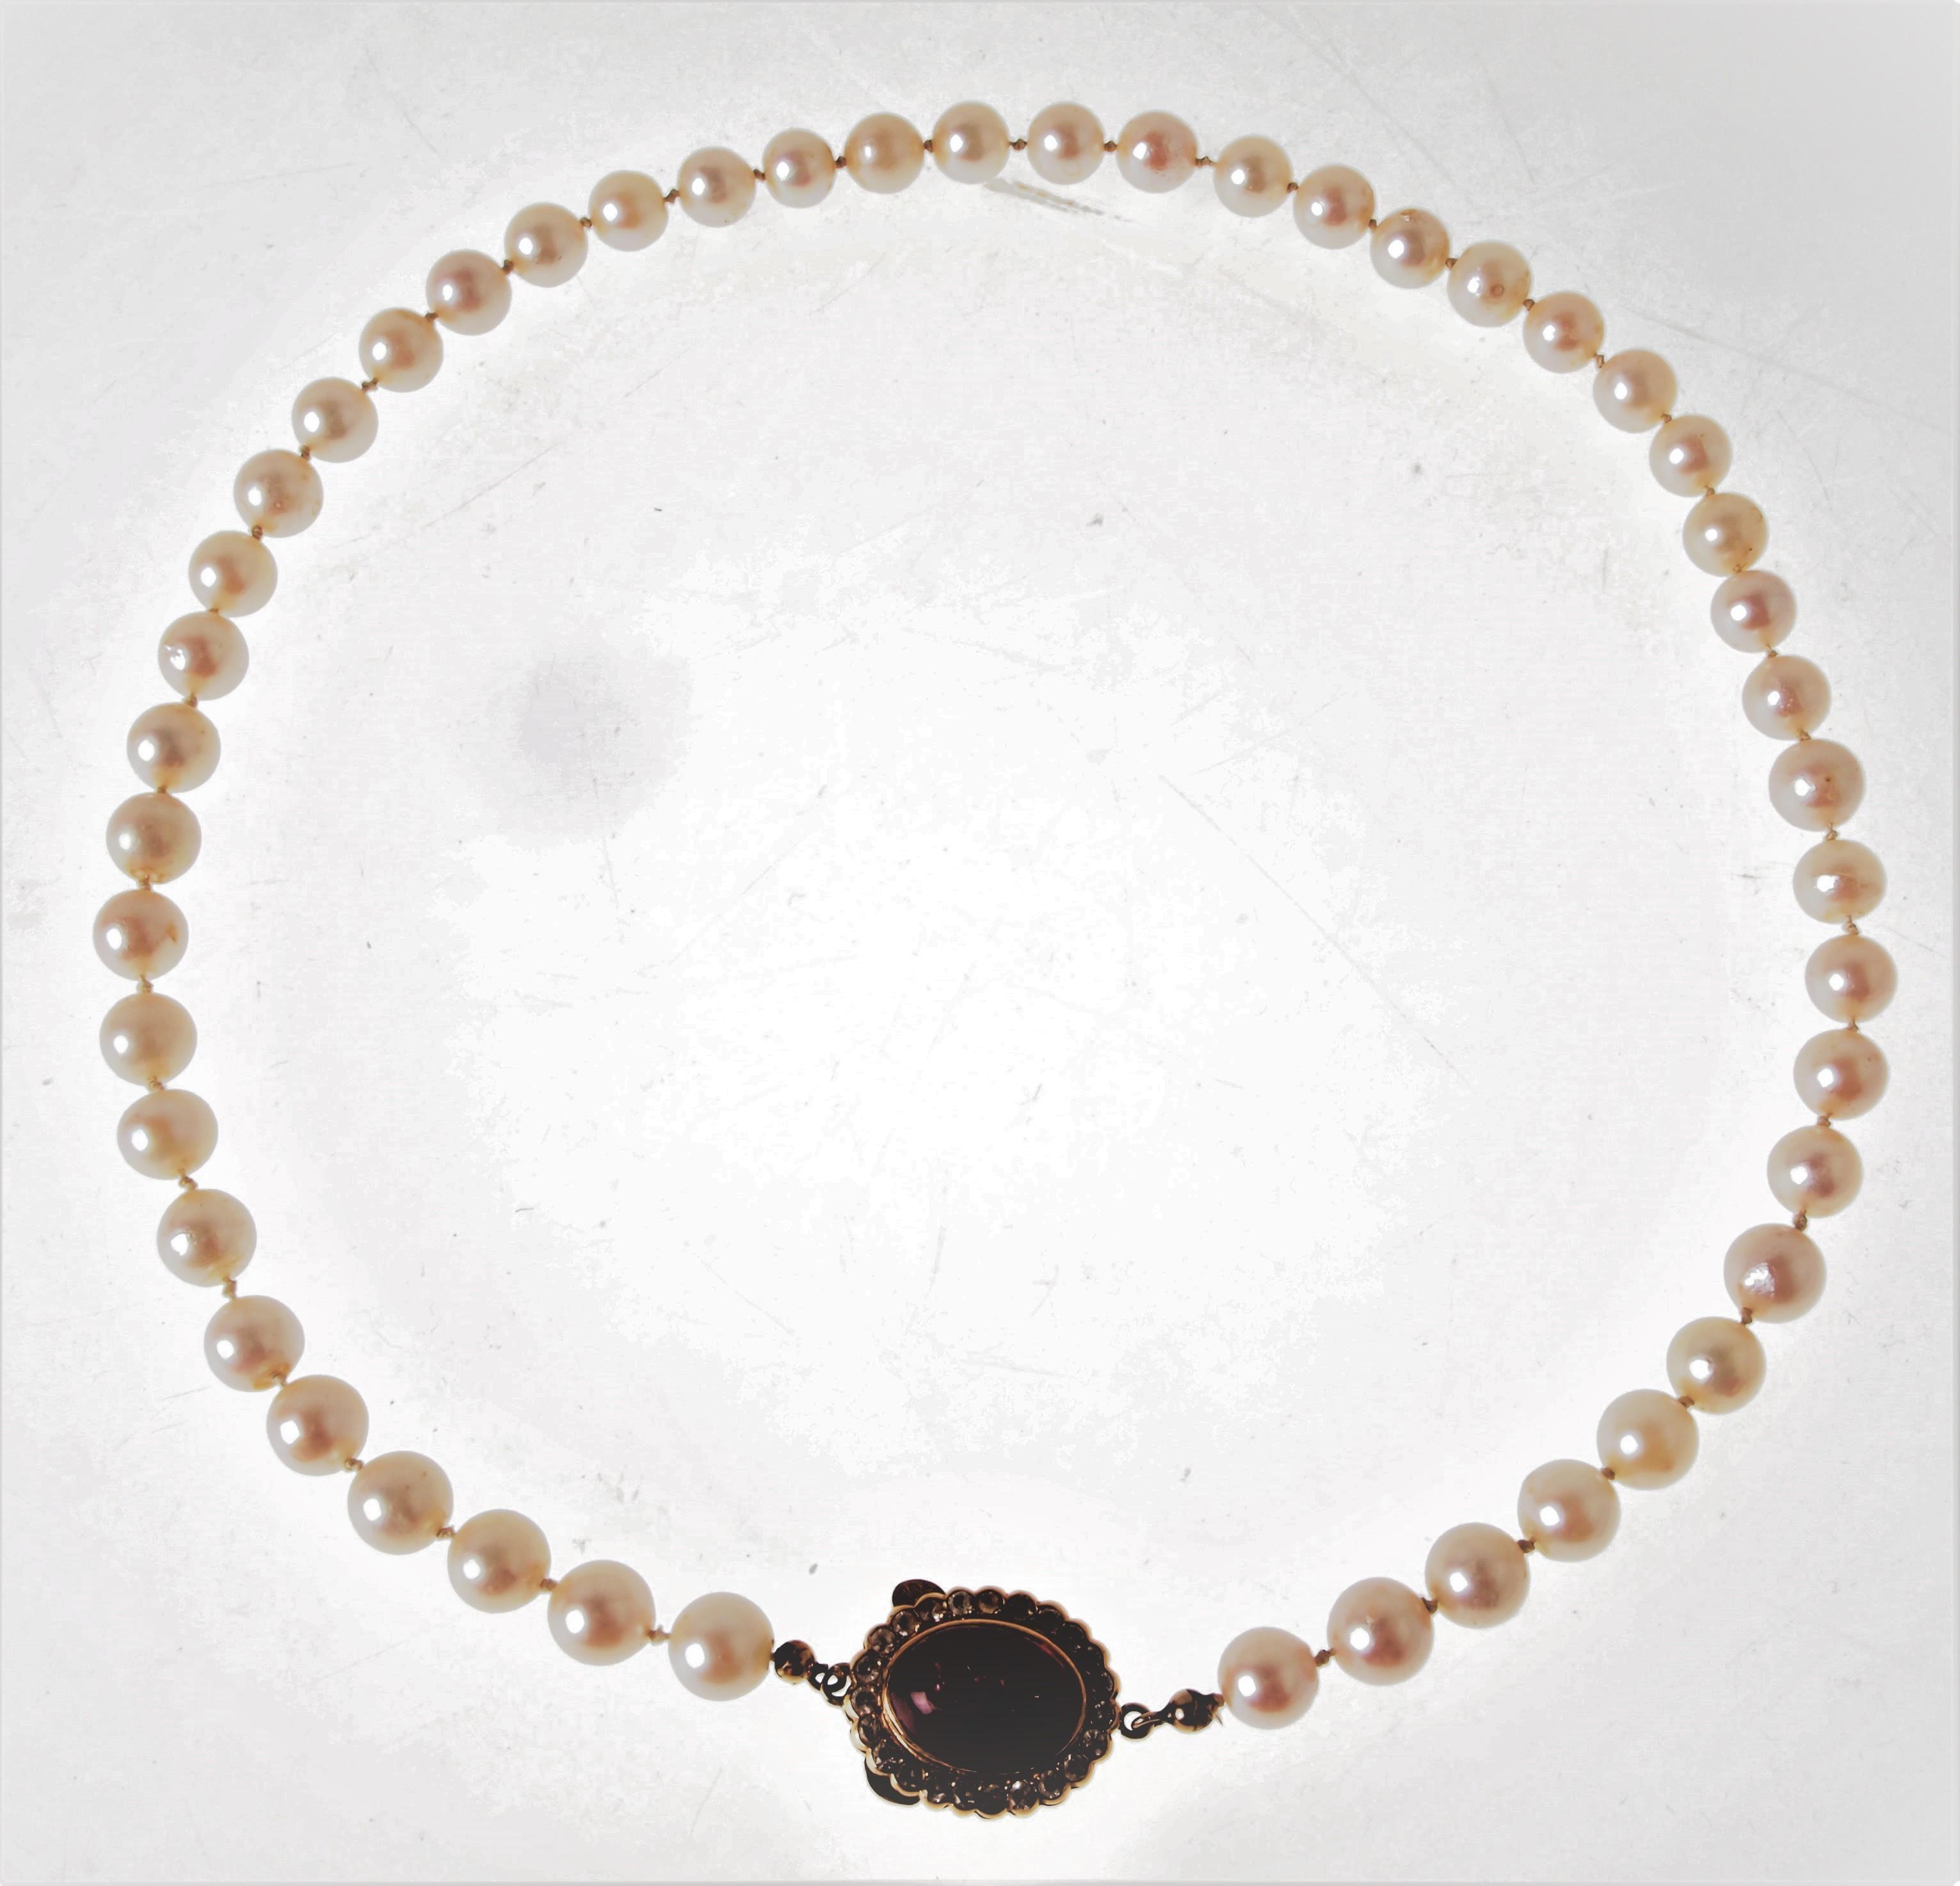 HALSBAND ODLADE PÄRLOR LÅS 18 K GULD. Jewellery   Gemstones - Necklace -  Auctionet cb0b73c920980